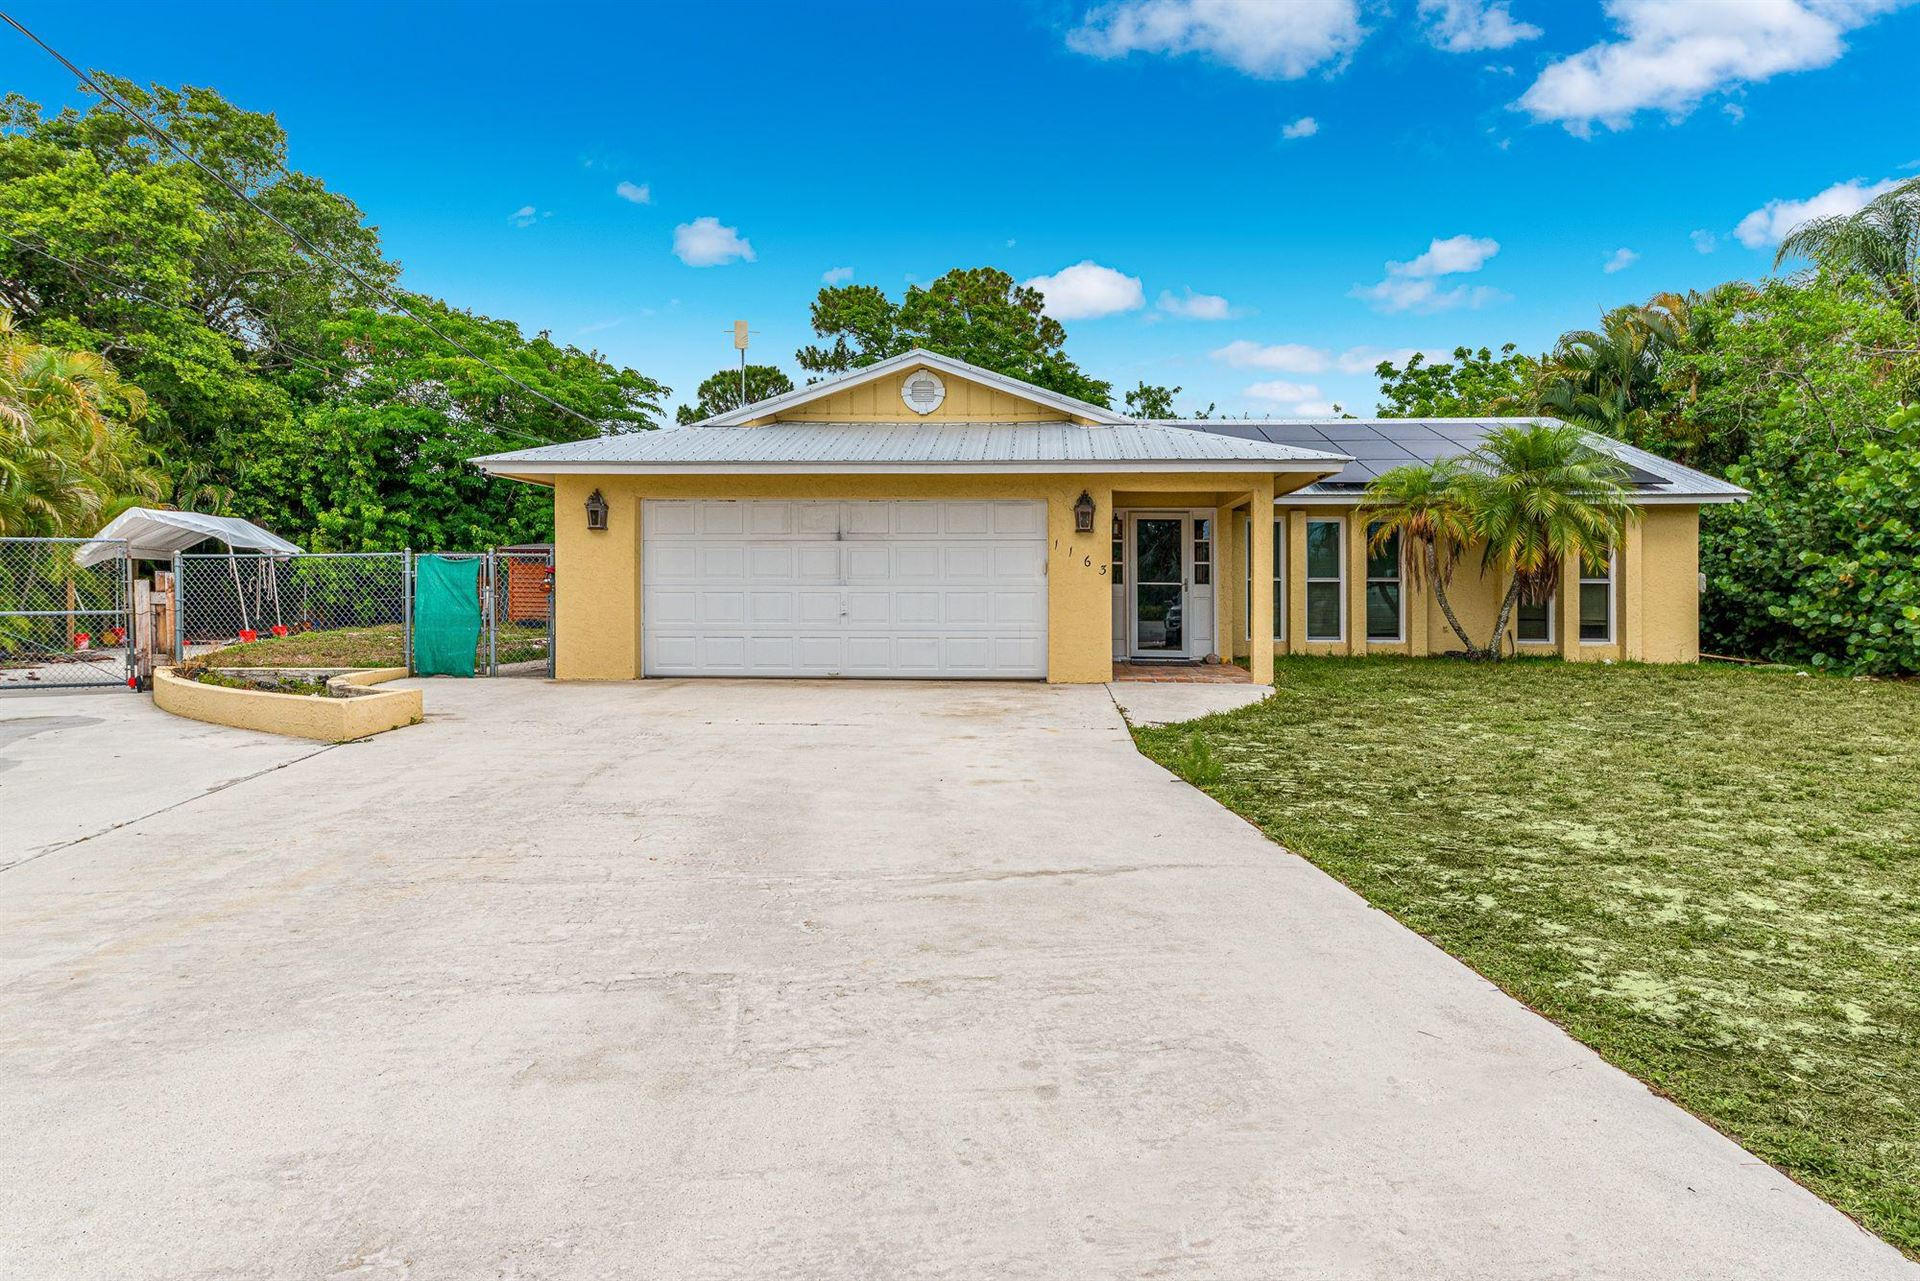 1163 NW 16th Place, Stuart, FL 34994 - #: RX-10718996